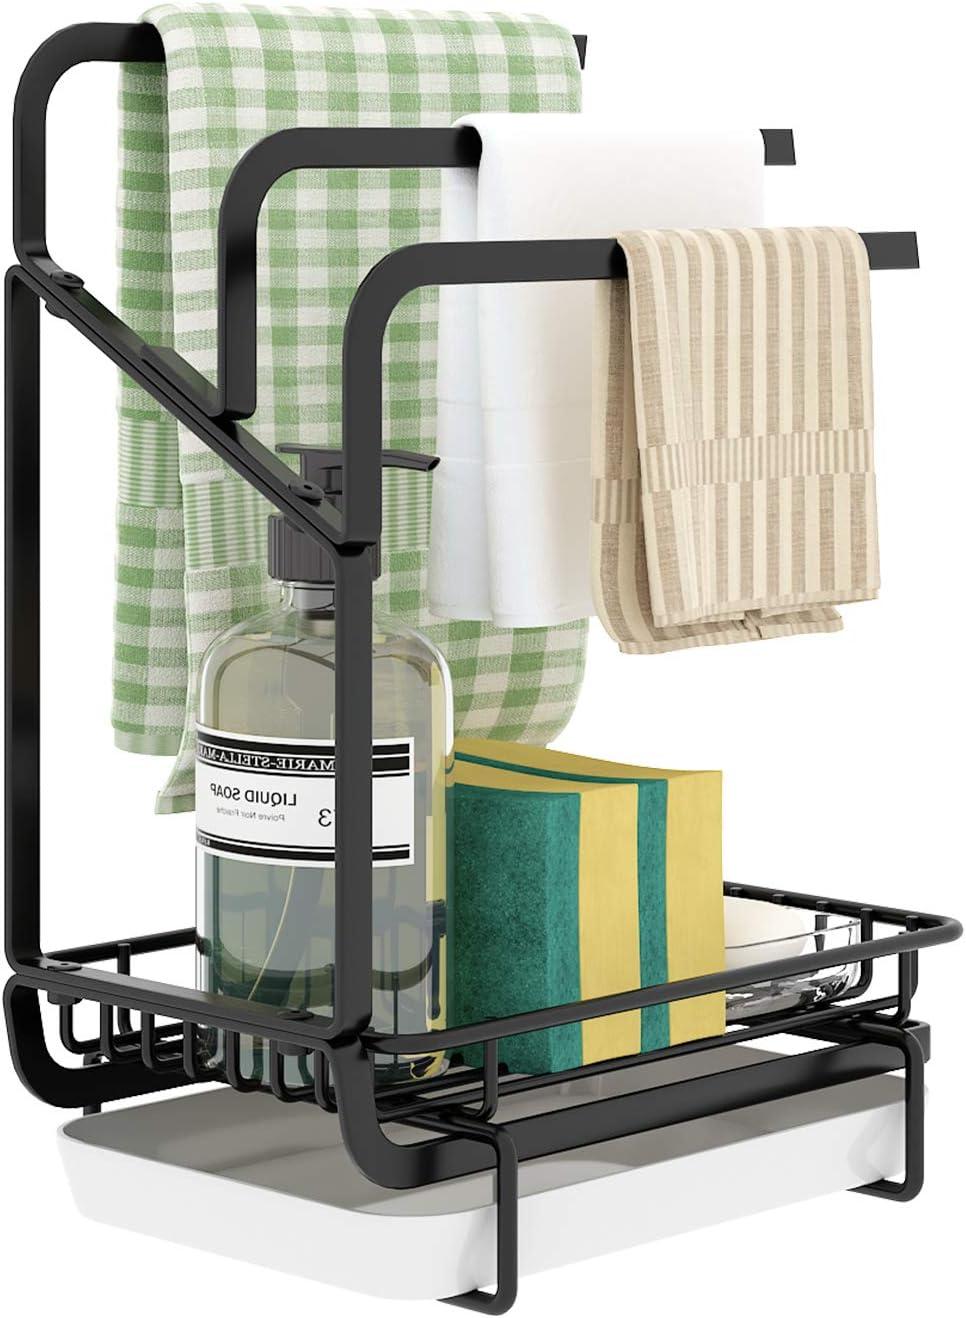 ICEETING Kitchen Shipping included Sink Organizer Sponge Nippon regular agency Towel with Holder Rack